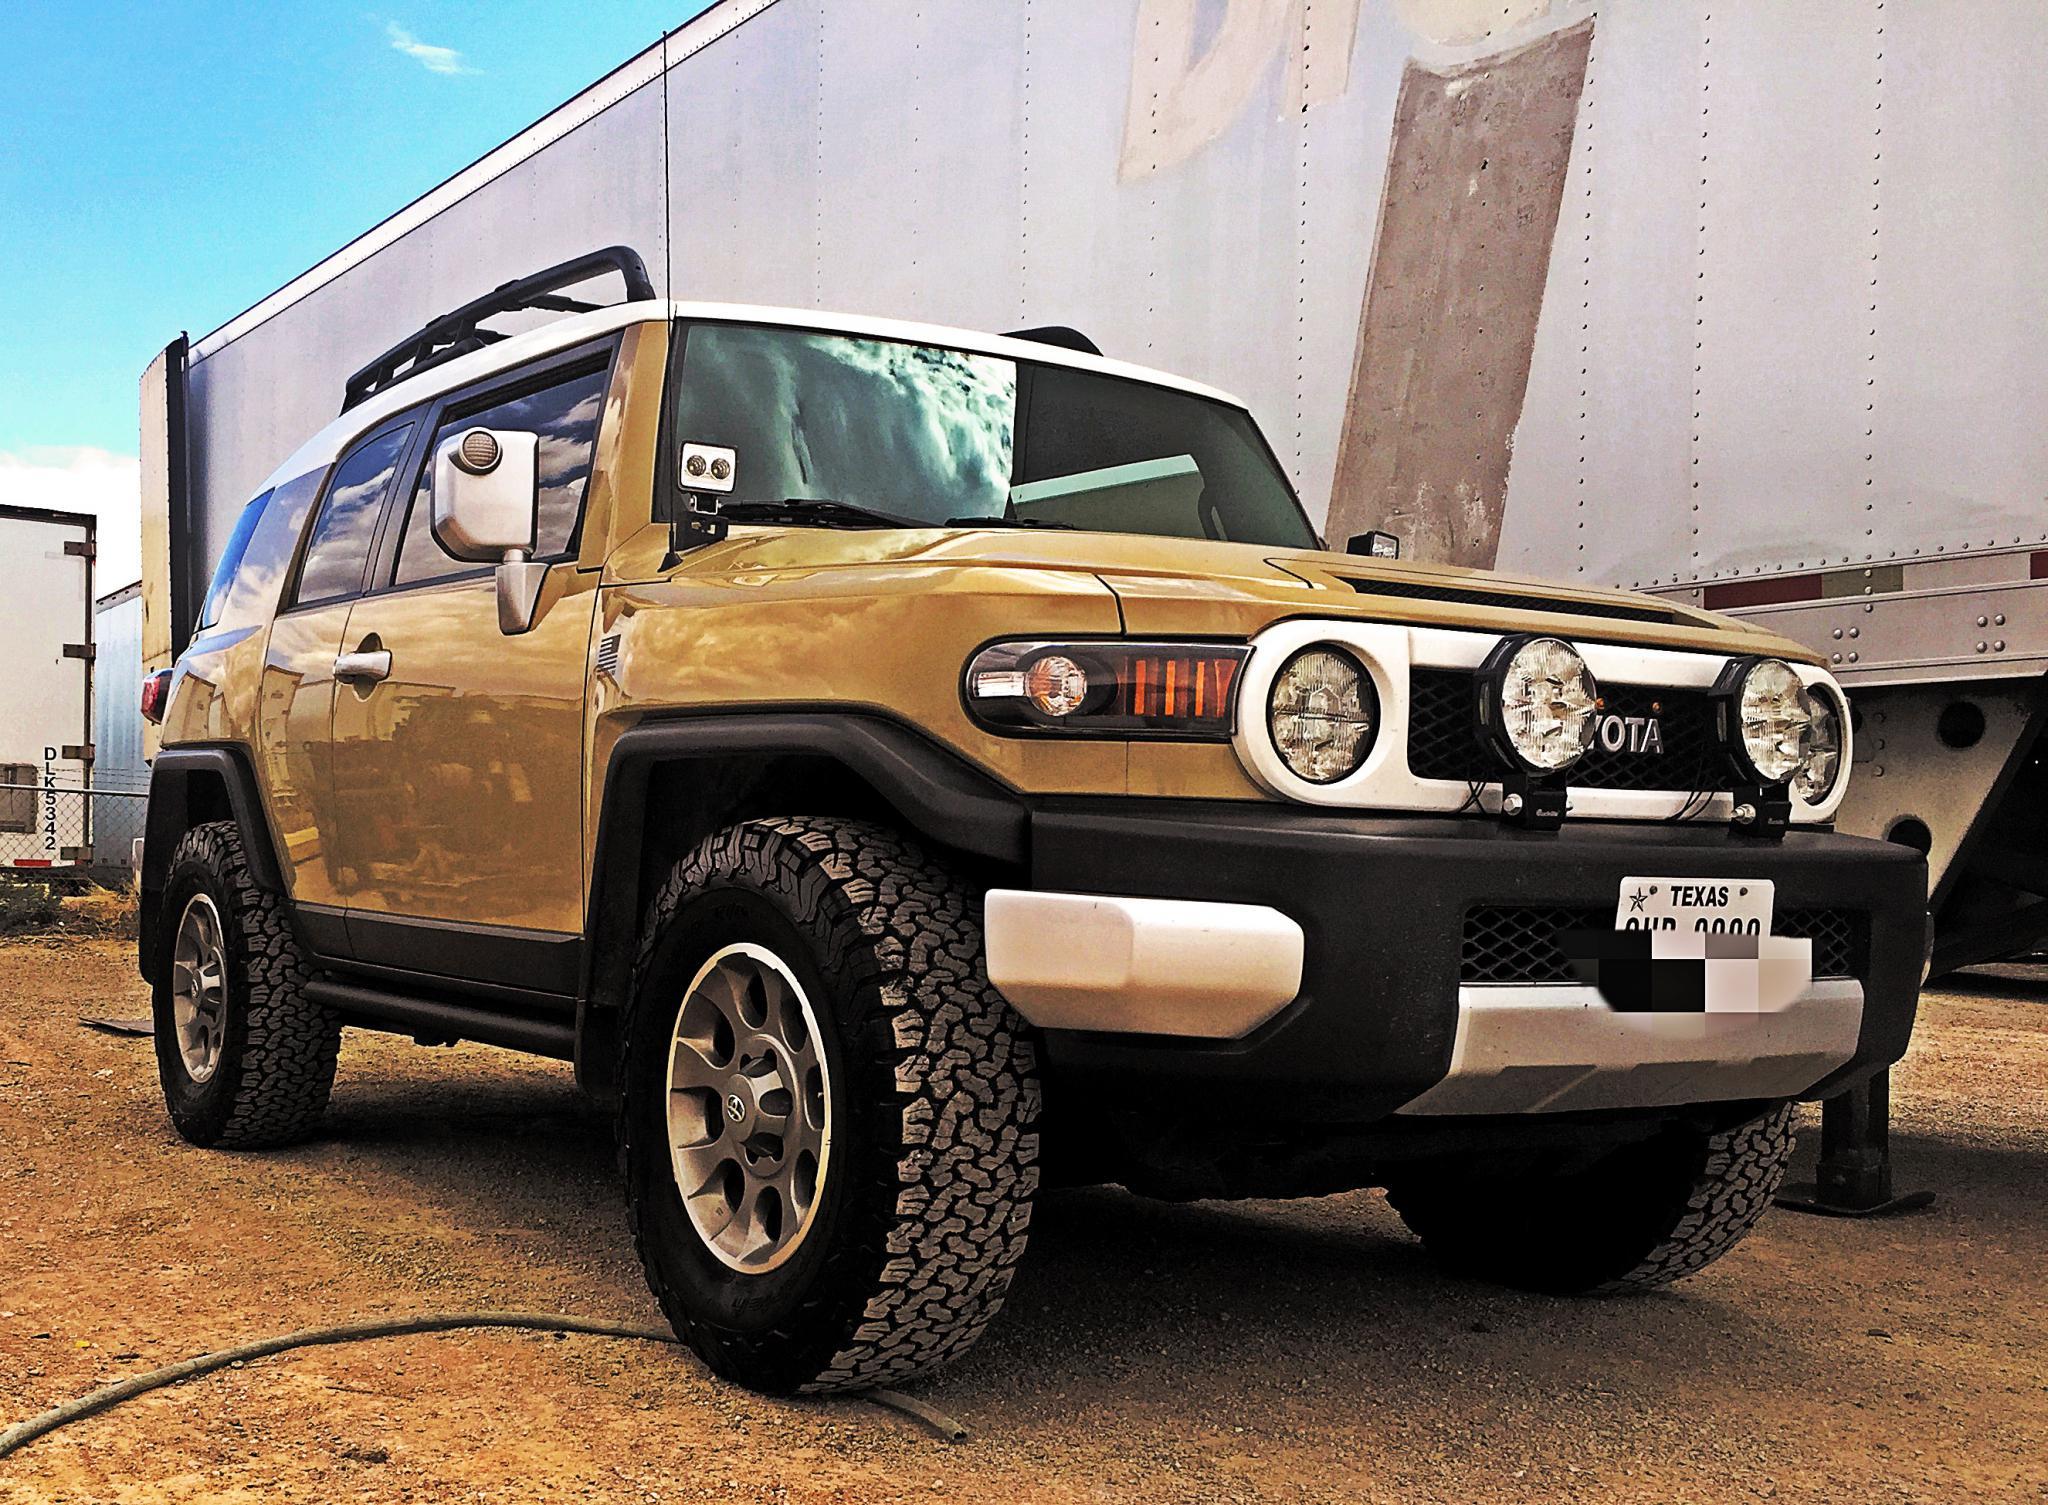 jeep led headlight retrofit toyota fj cruiser forum. Black Bedroom Furniture Sets. Home Design Ideas